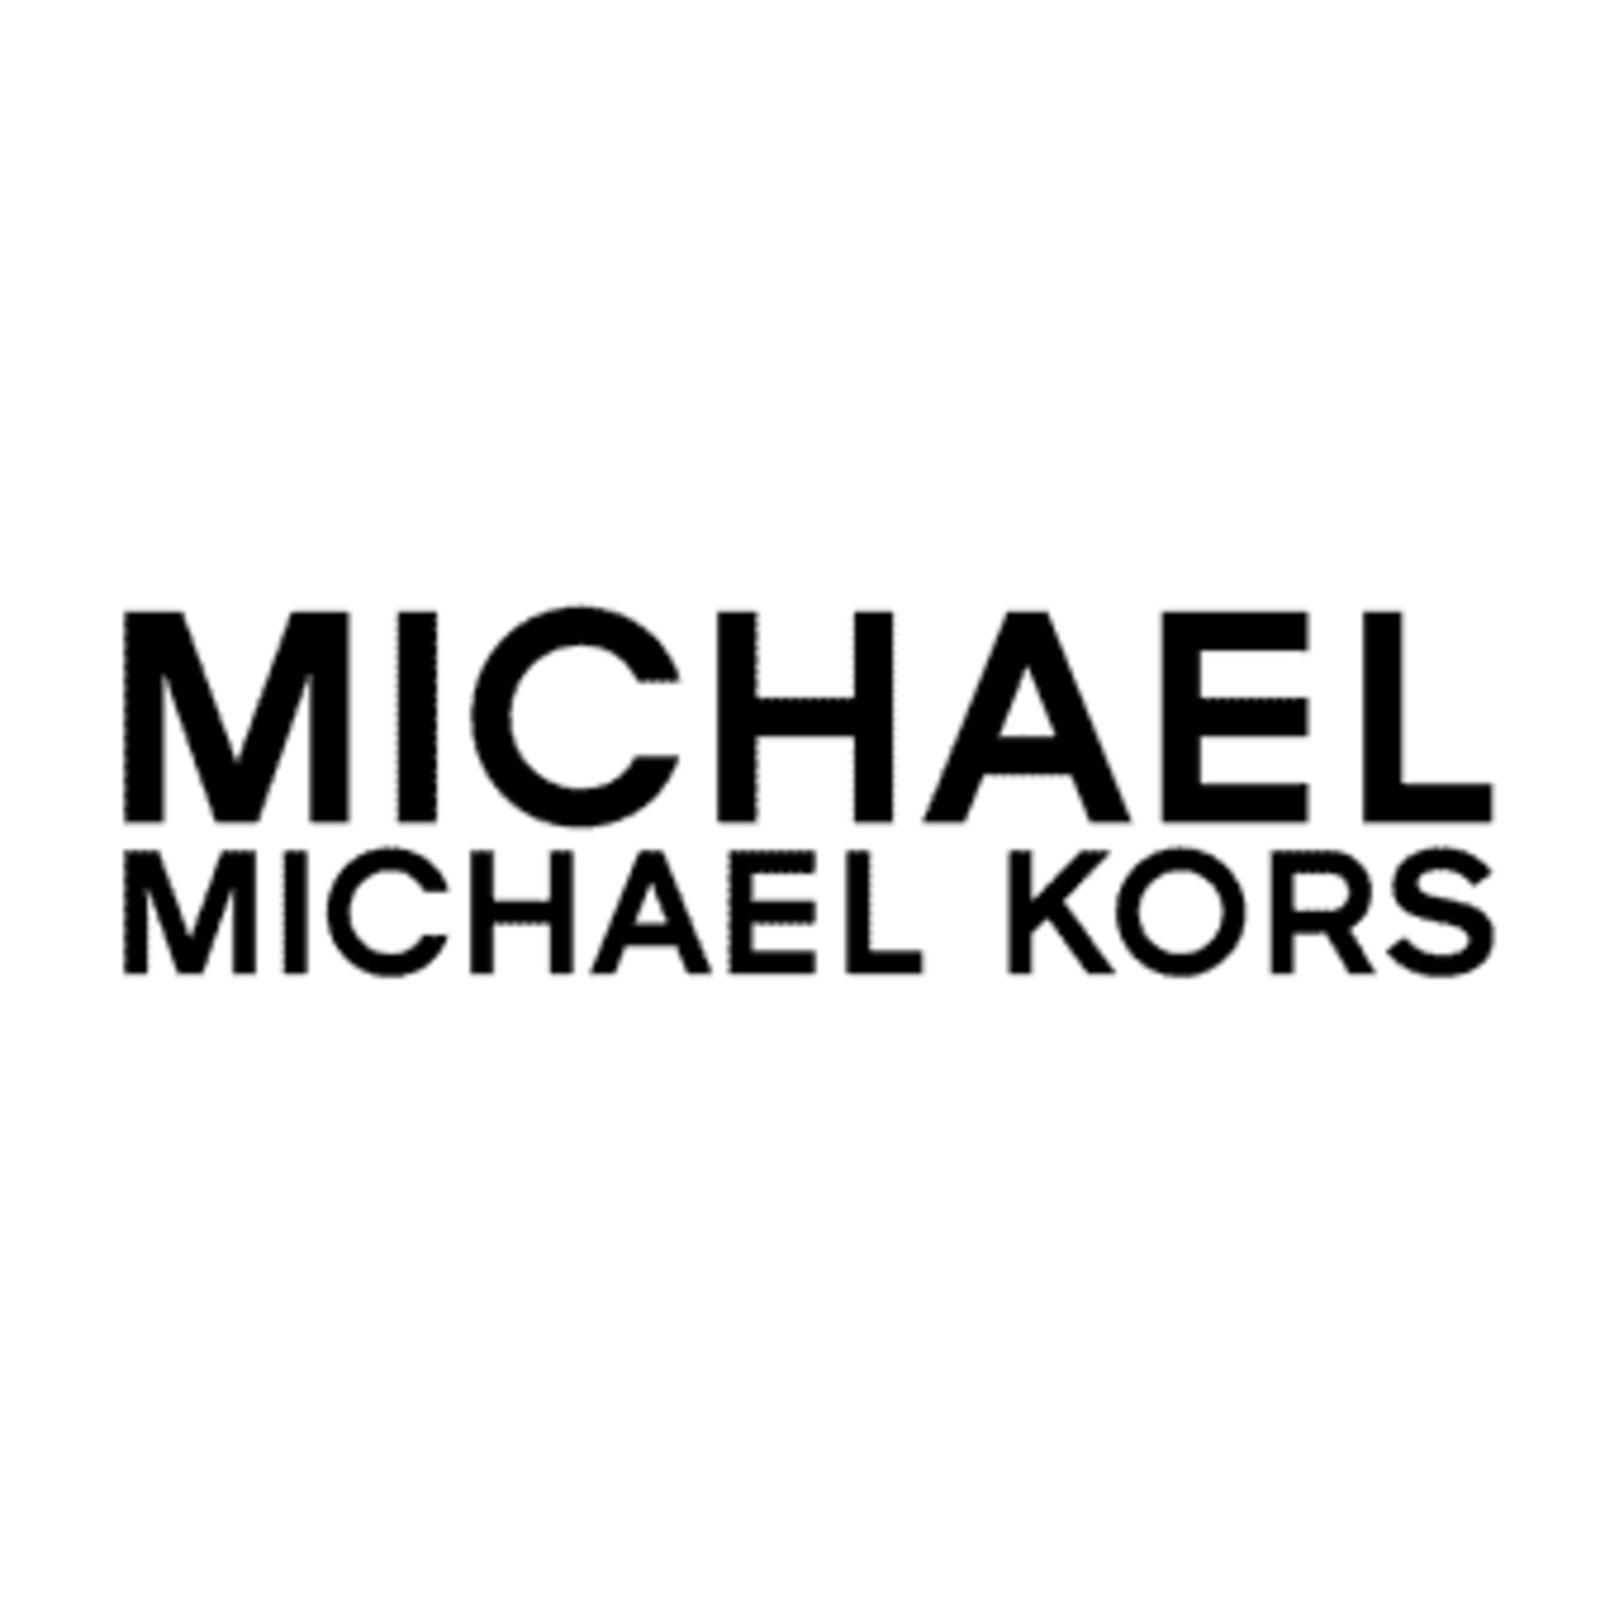 MICHAEL MICHAEL KORS in Brussels (Image 1)